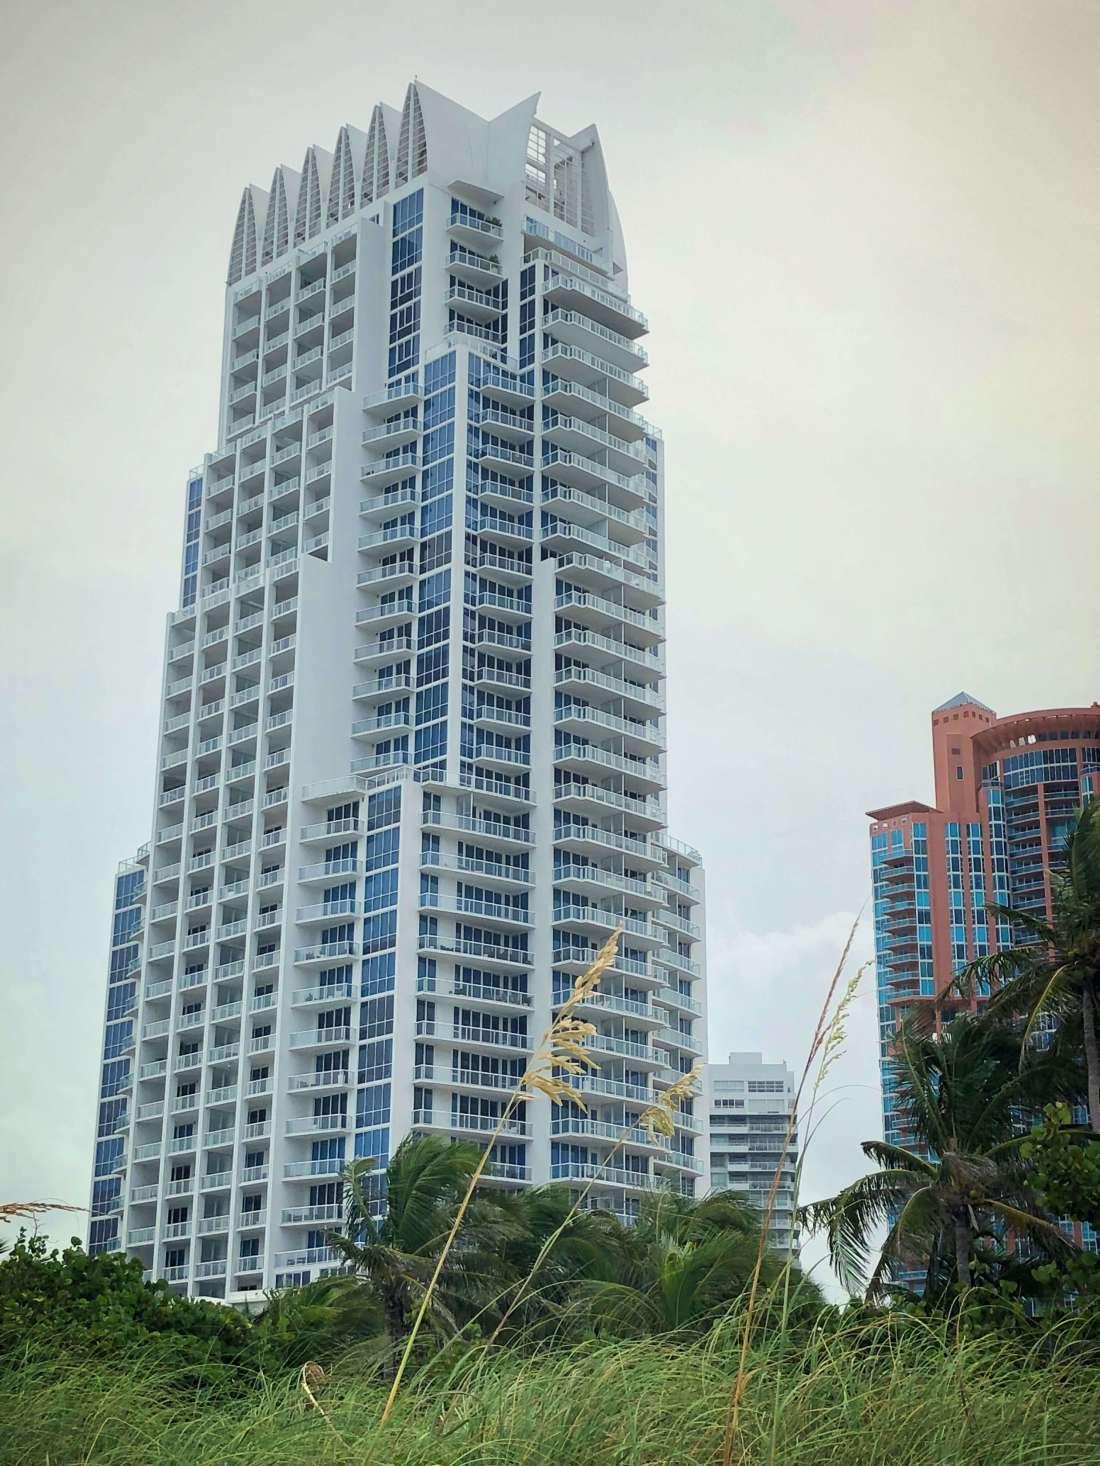 Residential building near Miami beach